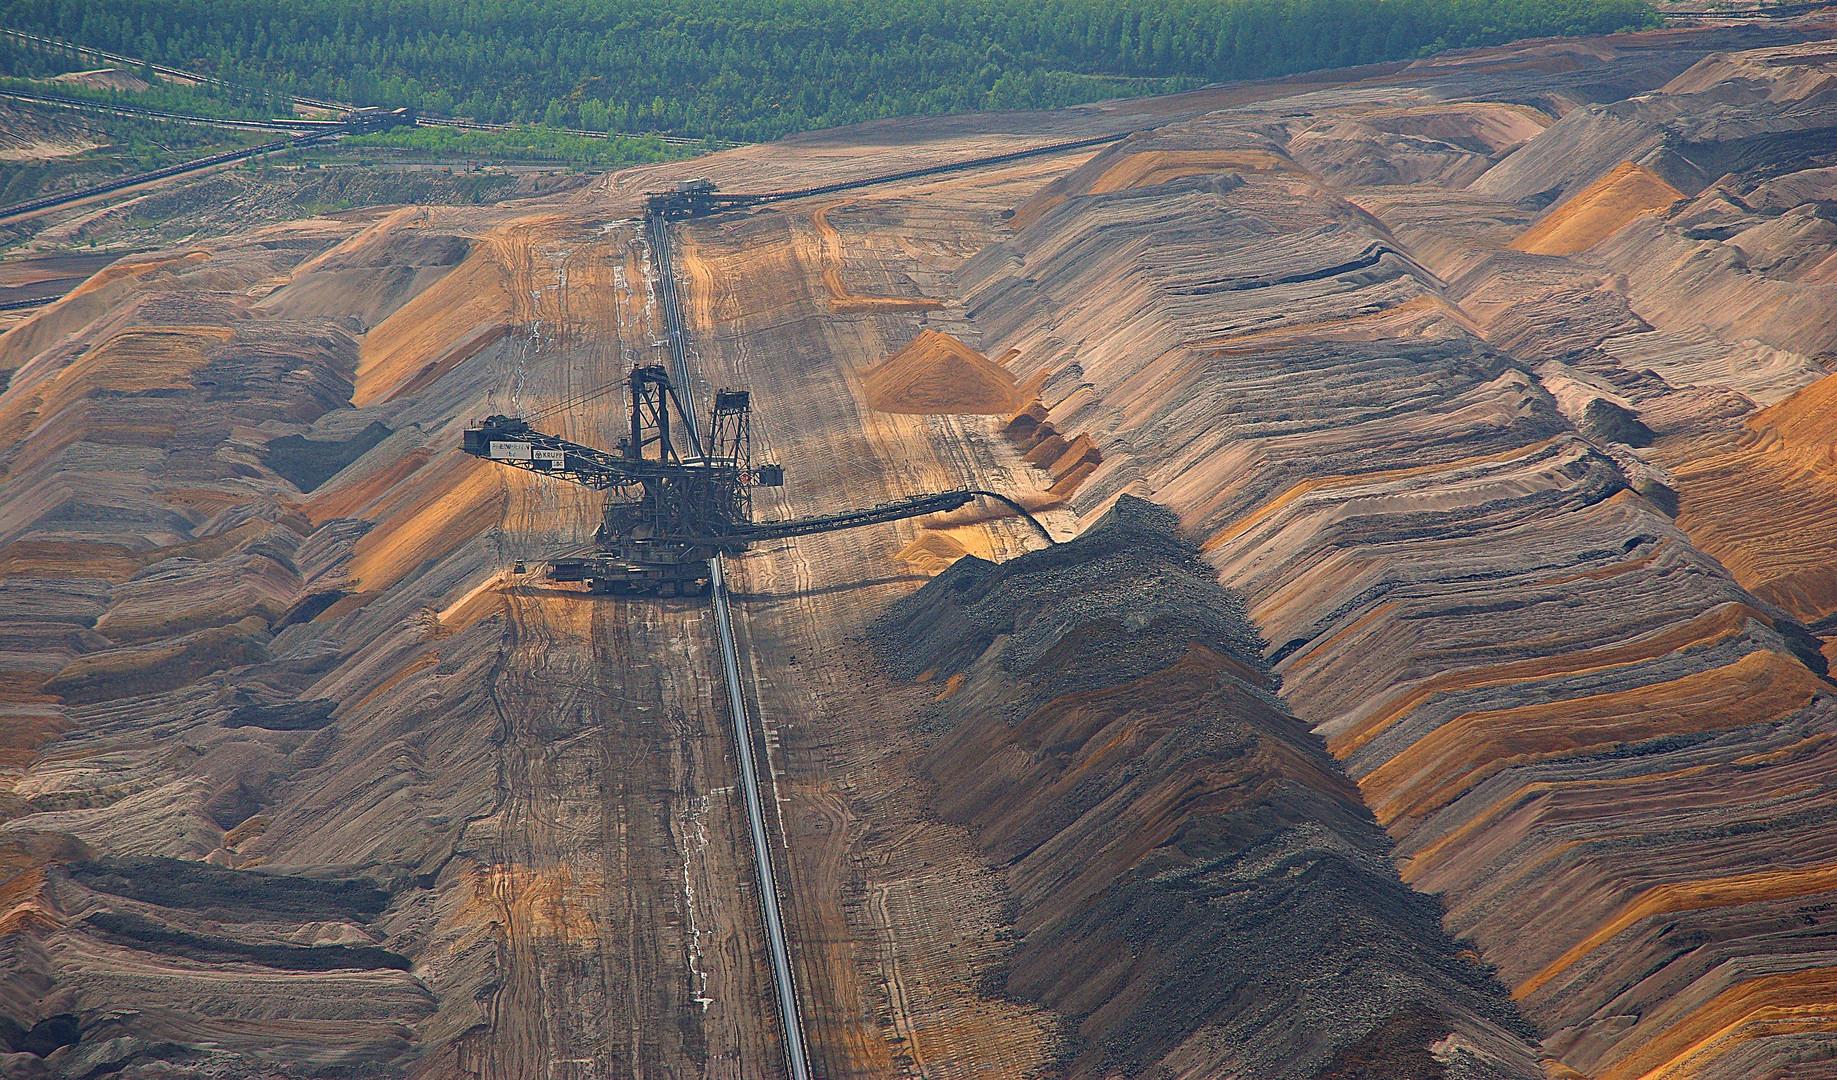 Tagebau - Landschaft